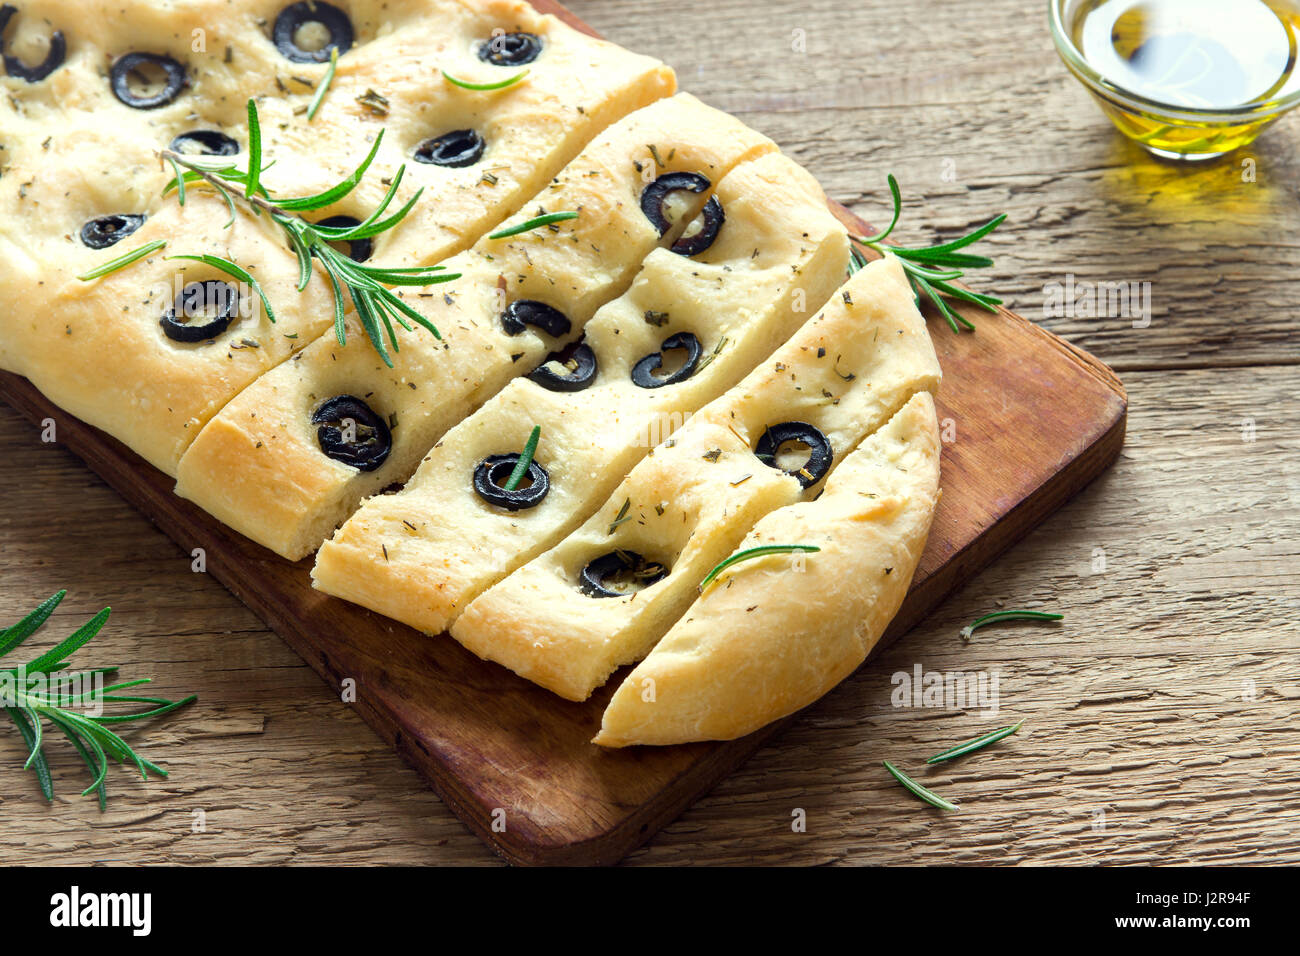 Italiano tradicional Focaccia con aceitunas negras y Romero - pan plano focaccia casera Imagen De Stock